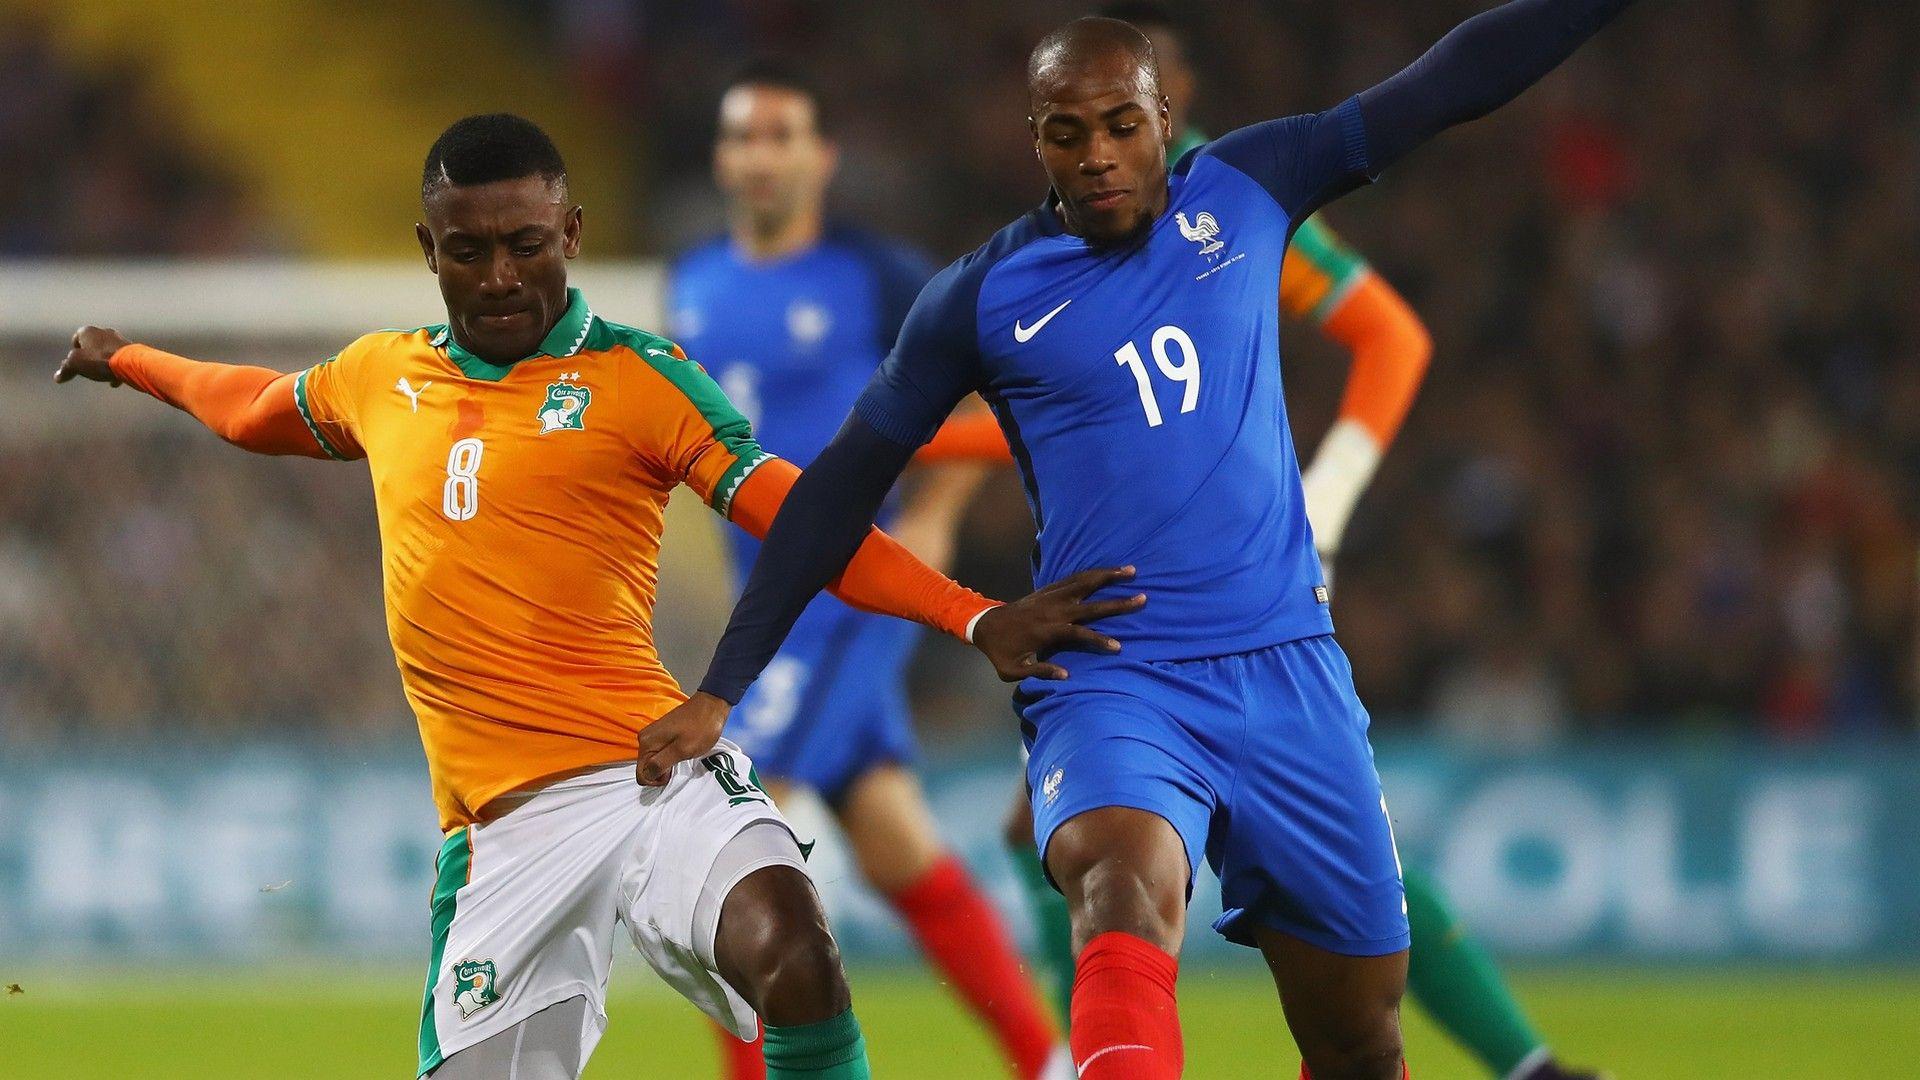 France Ivory Coast Djibril Sidibe Salomon Kalou Friendly 15112016